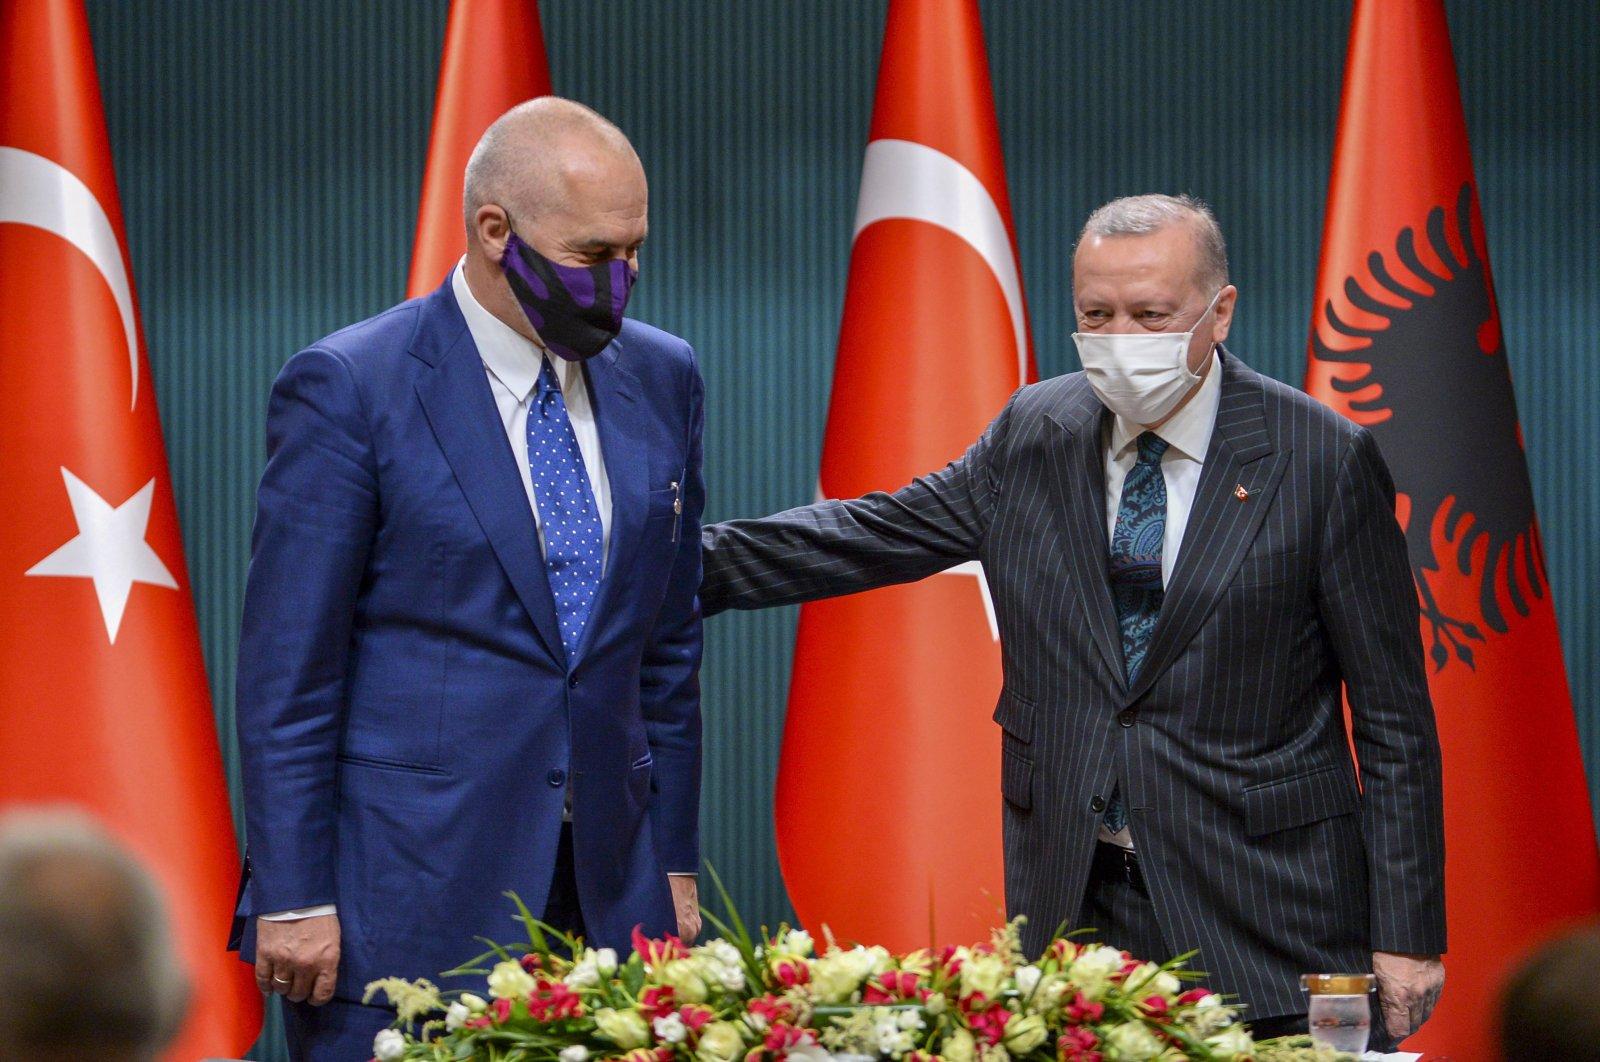 Turkish President Recep Tayyip Erdoğan (R) and his Albanian counterpart Edi Rama pose in a press conference, Ankara, Jan. 6, 2021. (Photo by Ali Ekeyılmaz)